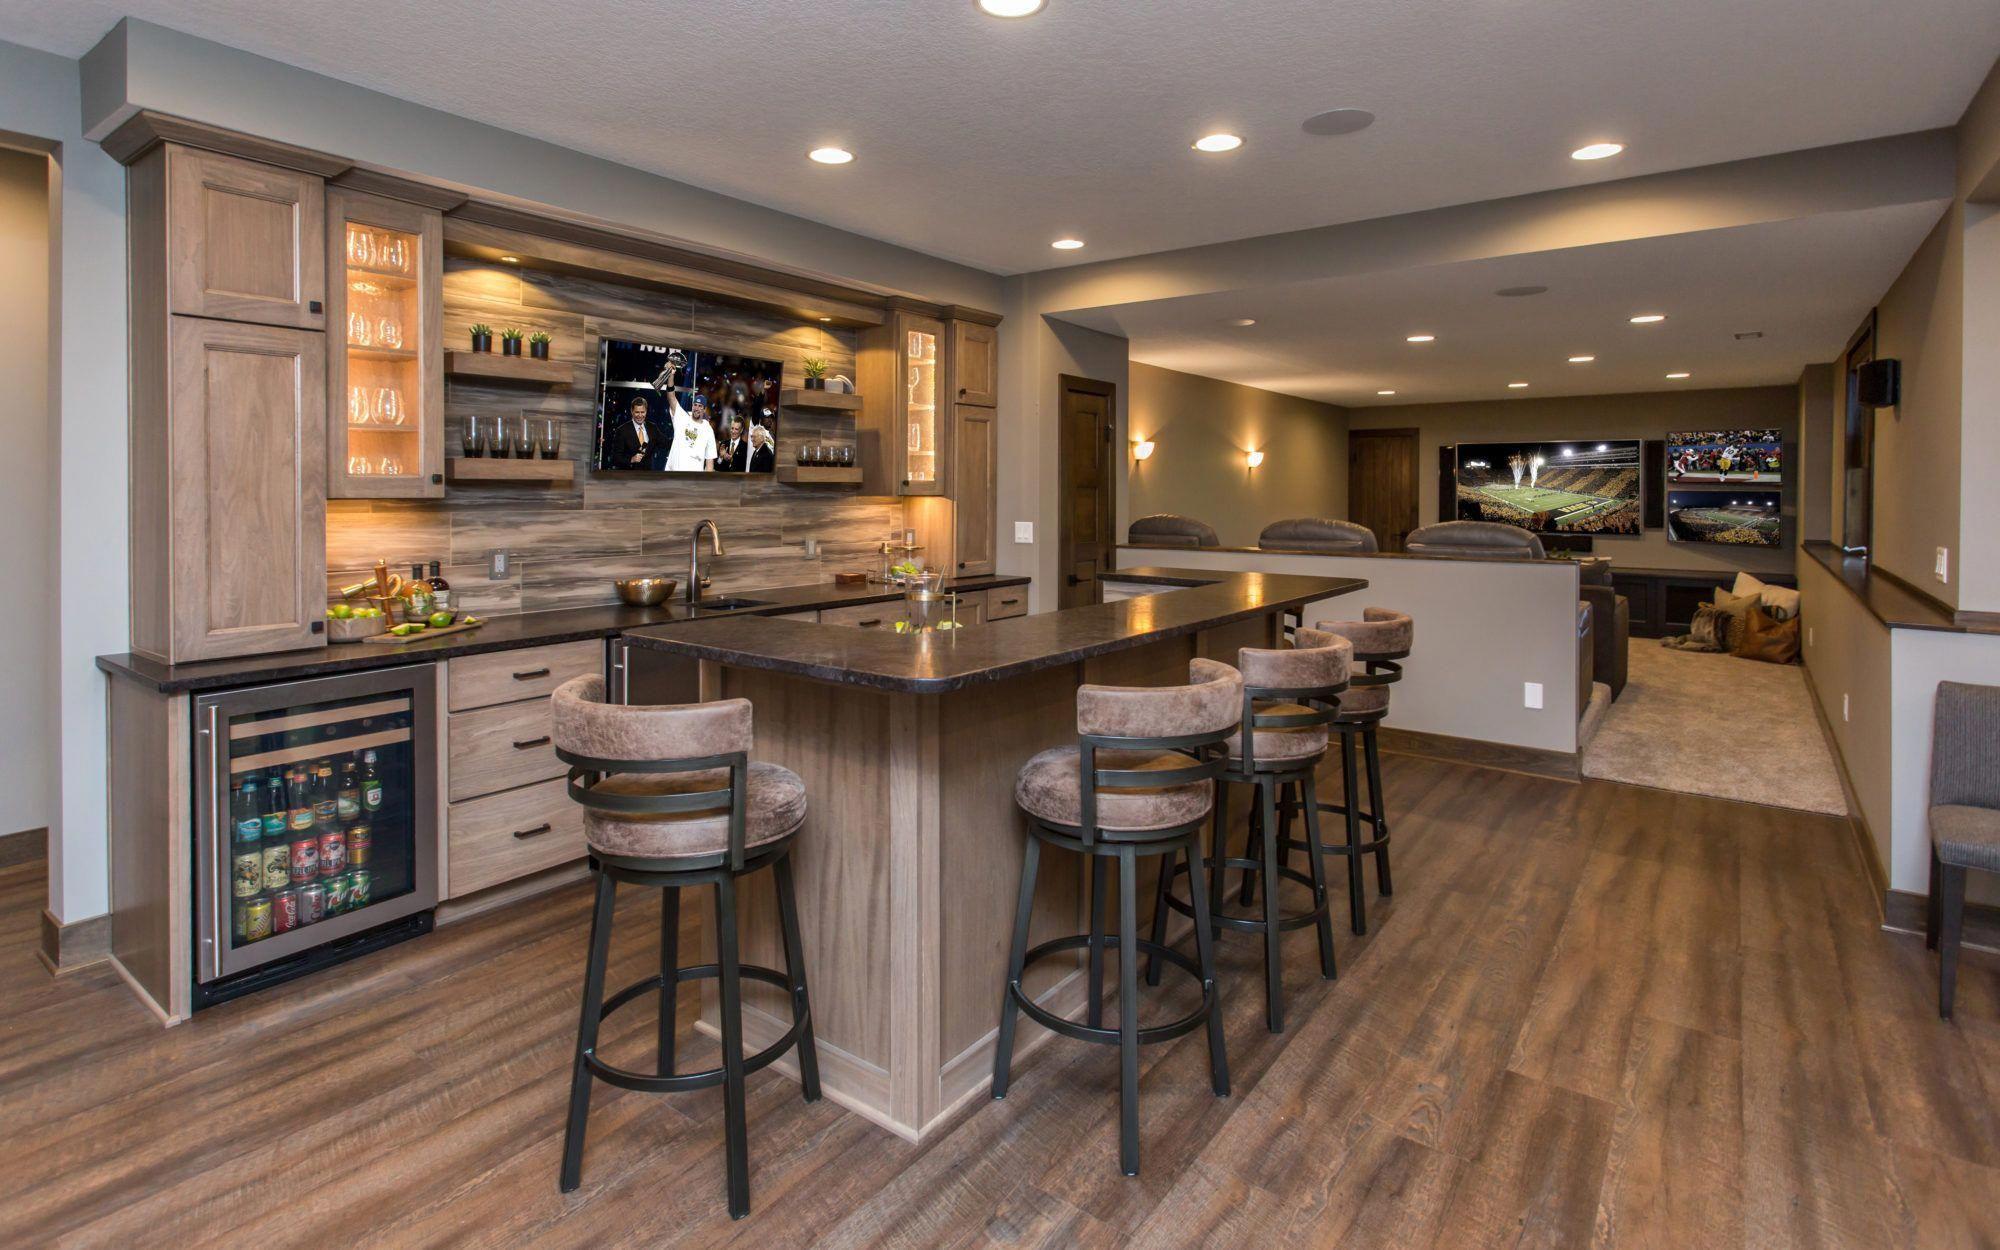 Diy Basement Design Diybasementdesign Basement Bar Design